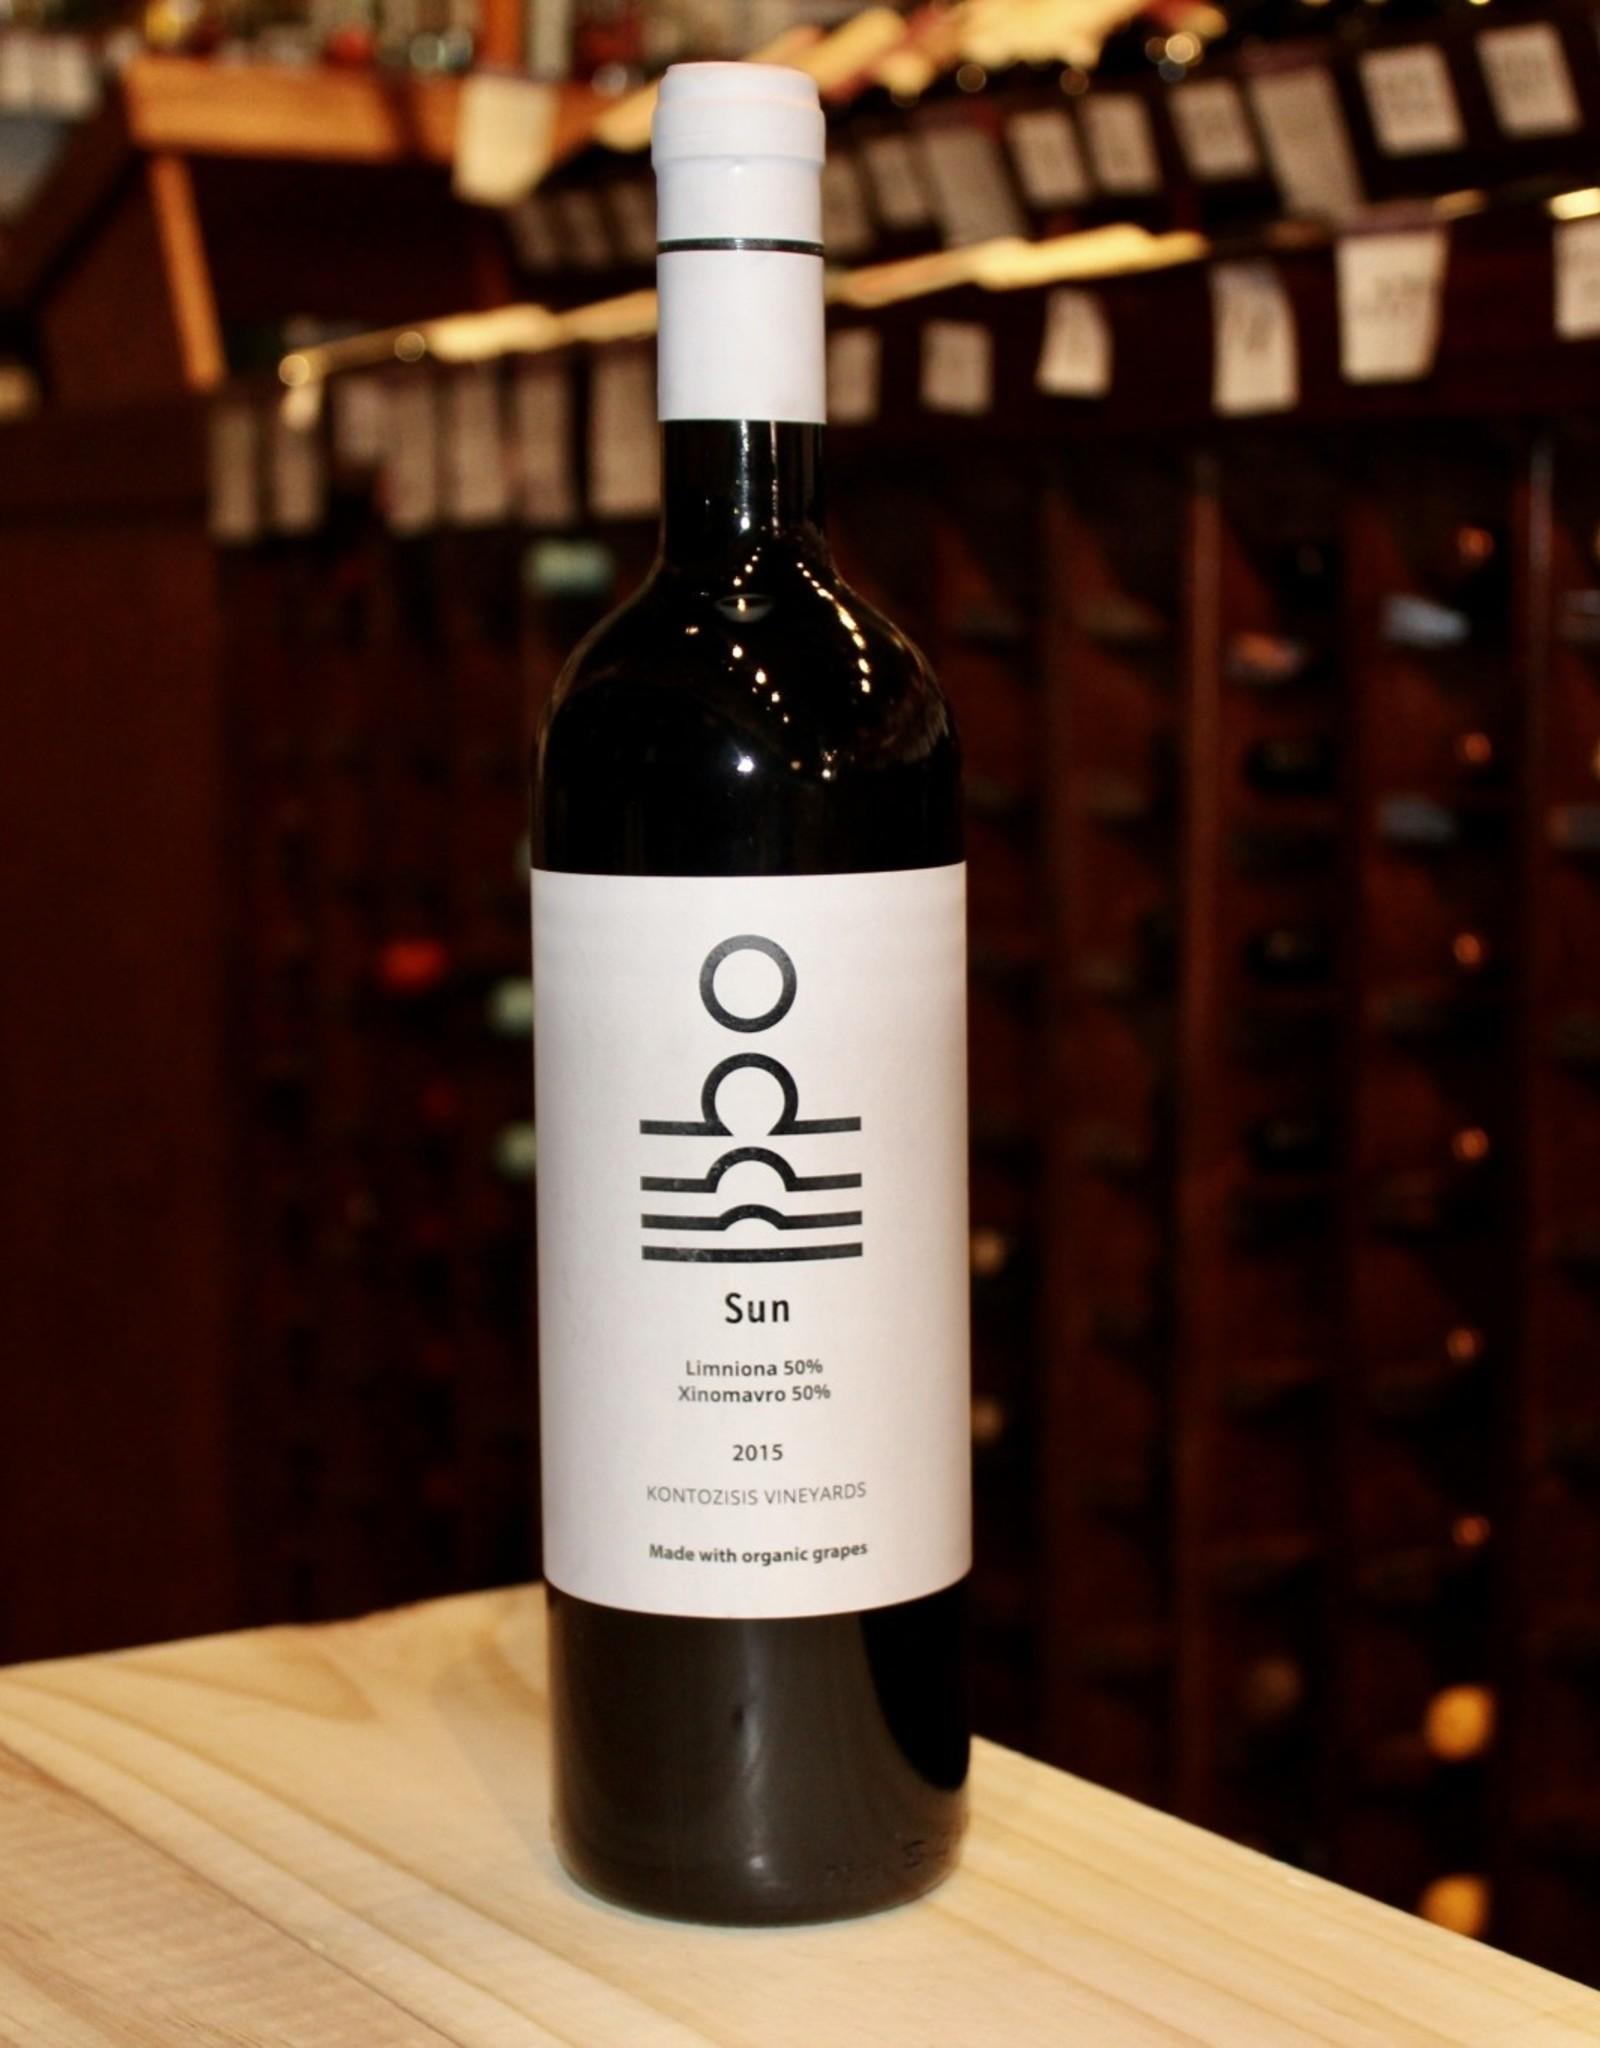 Wine 2015 Kontozisis Sun Limniona-Xinomavro - Karditsa, Thessalia, Greece